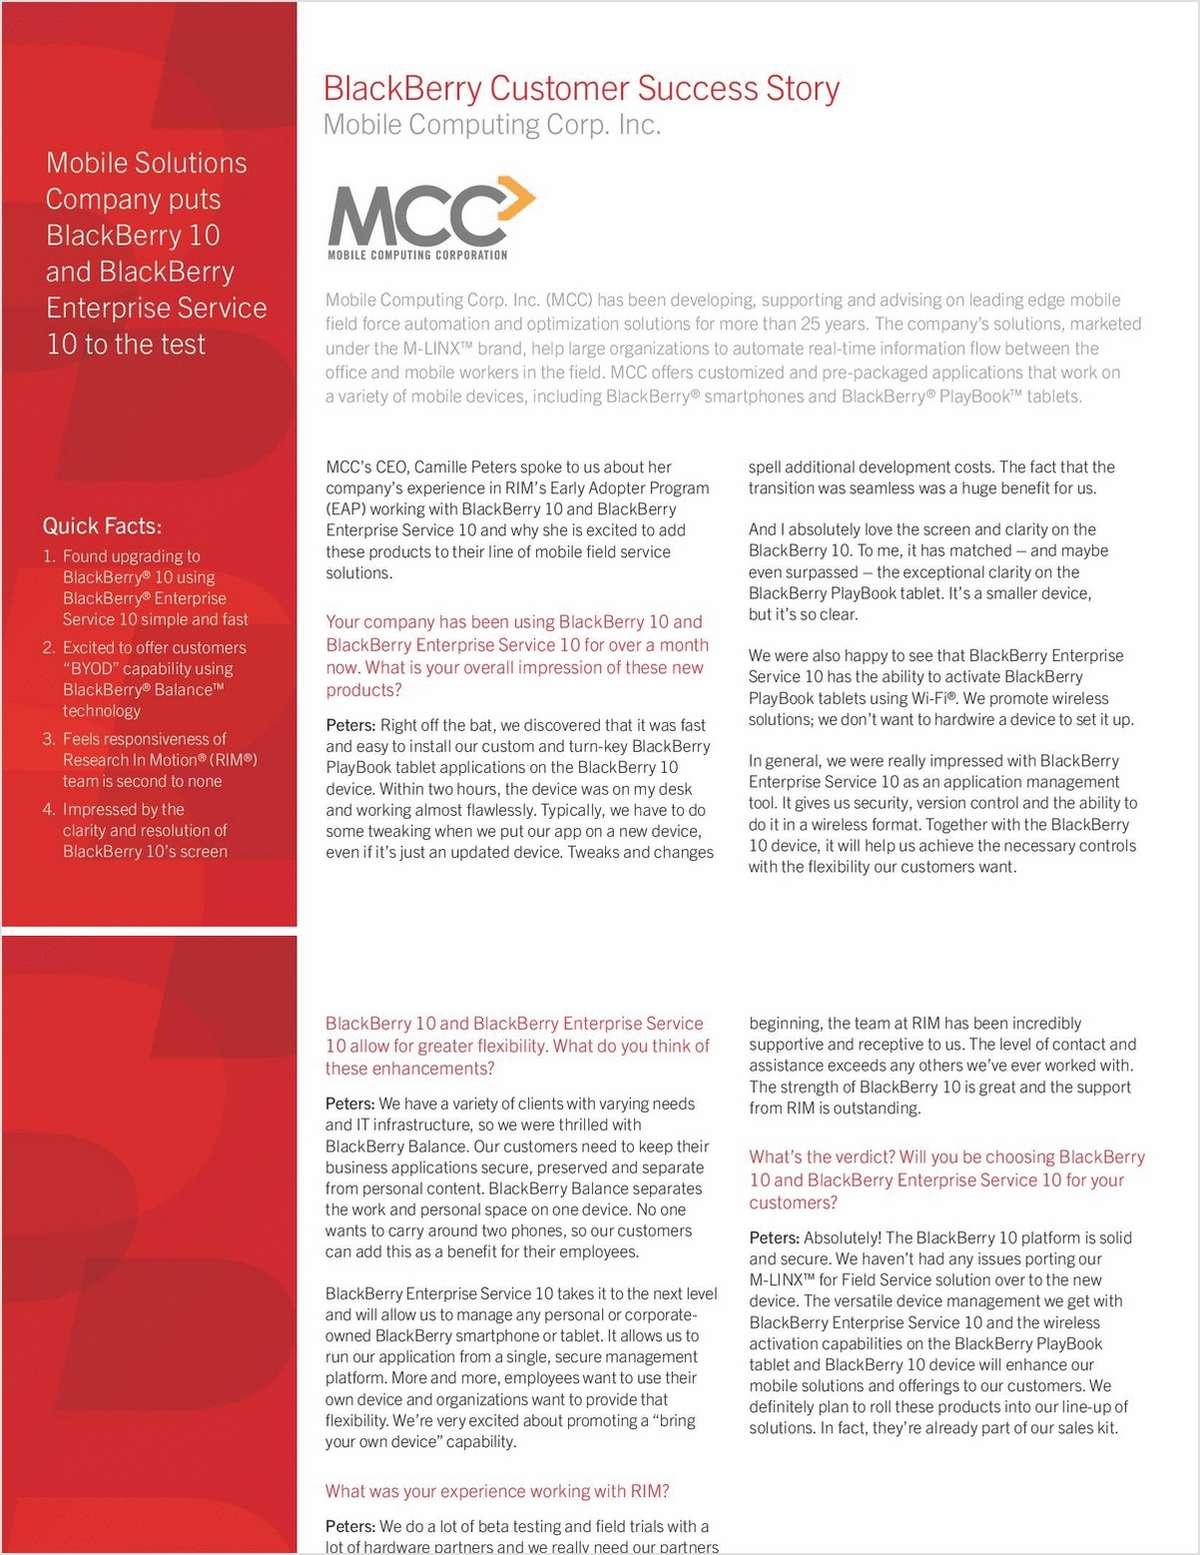 Enterprise Feedback: Why Mobile Computing Corp. Inc. Chose BlackBerry 10